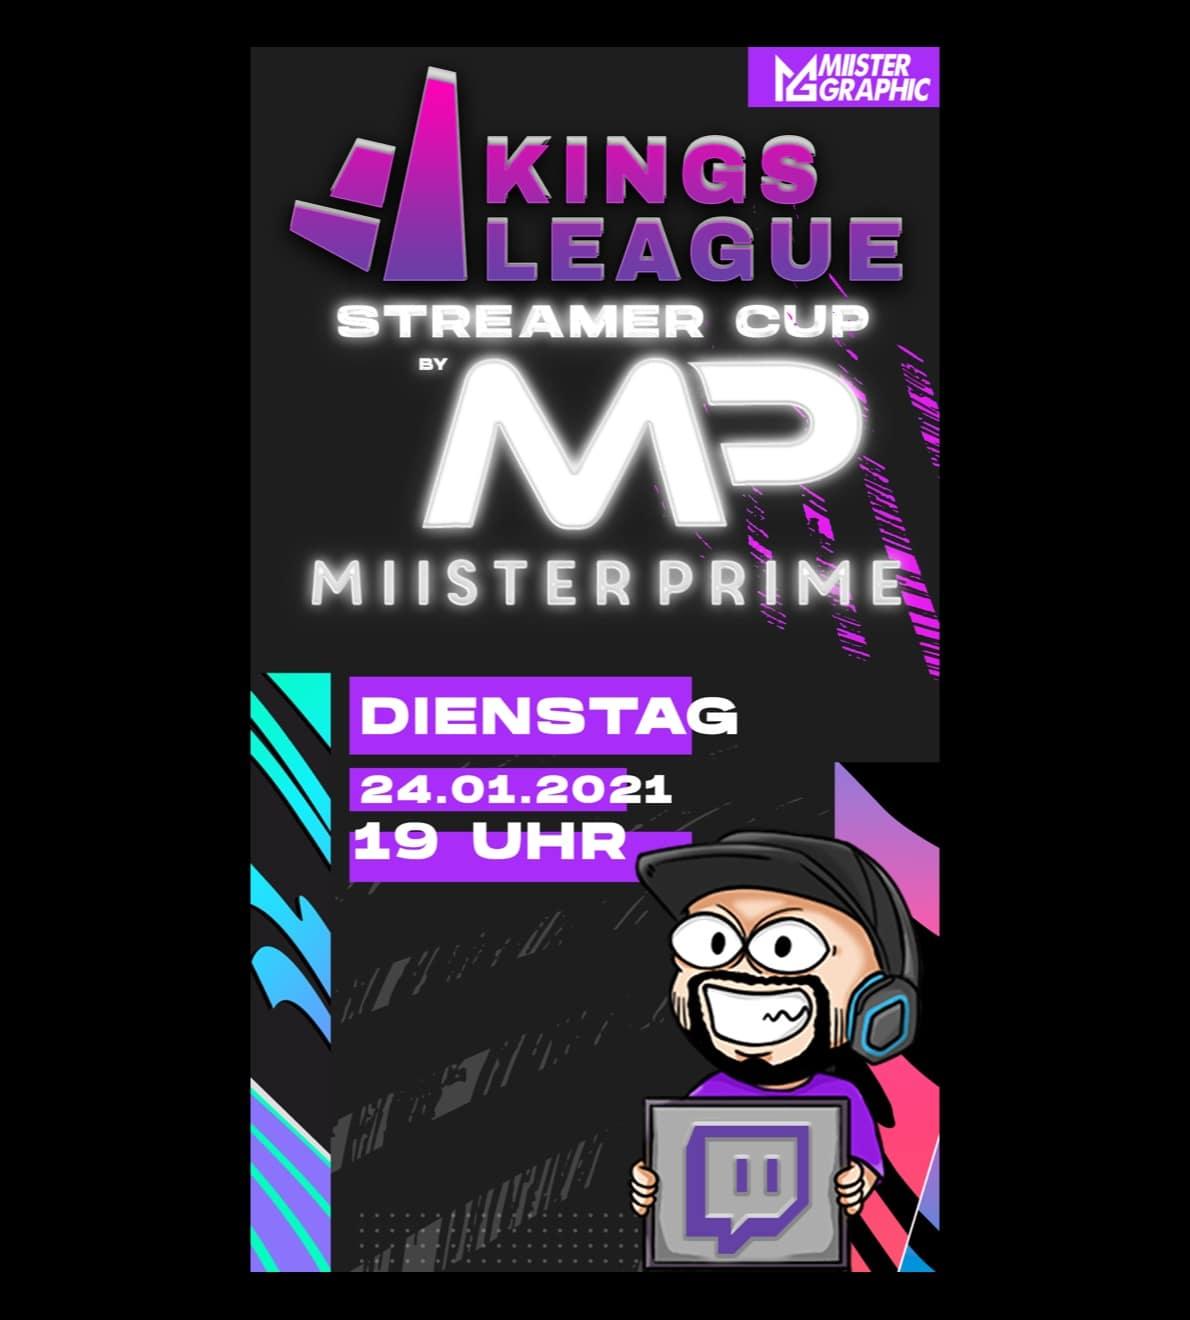 kingsleagues streamer cup by Miister prime